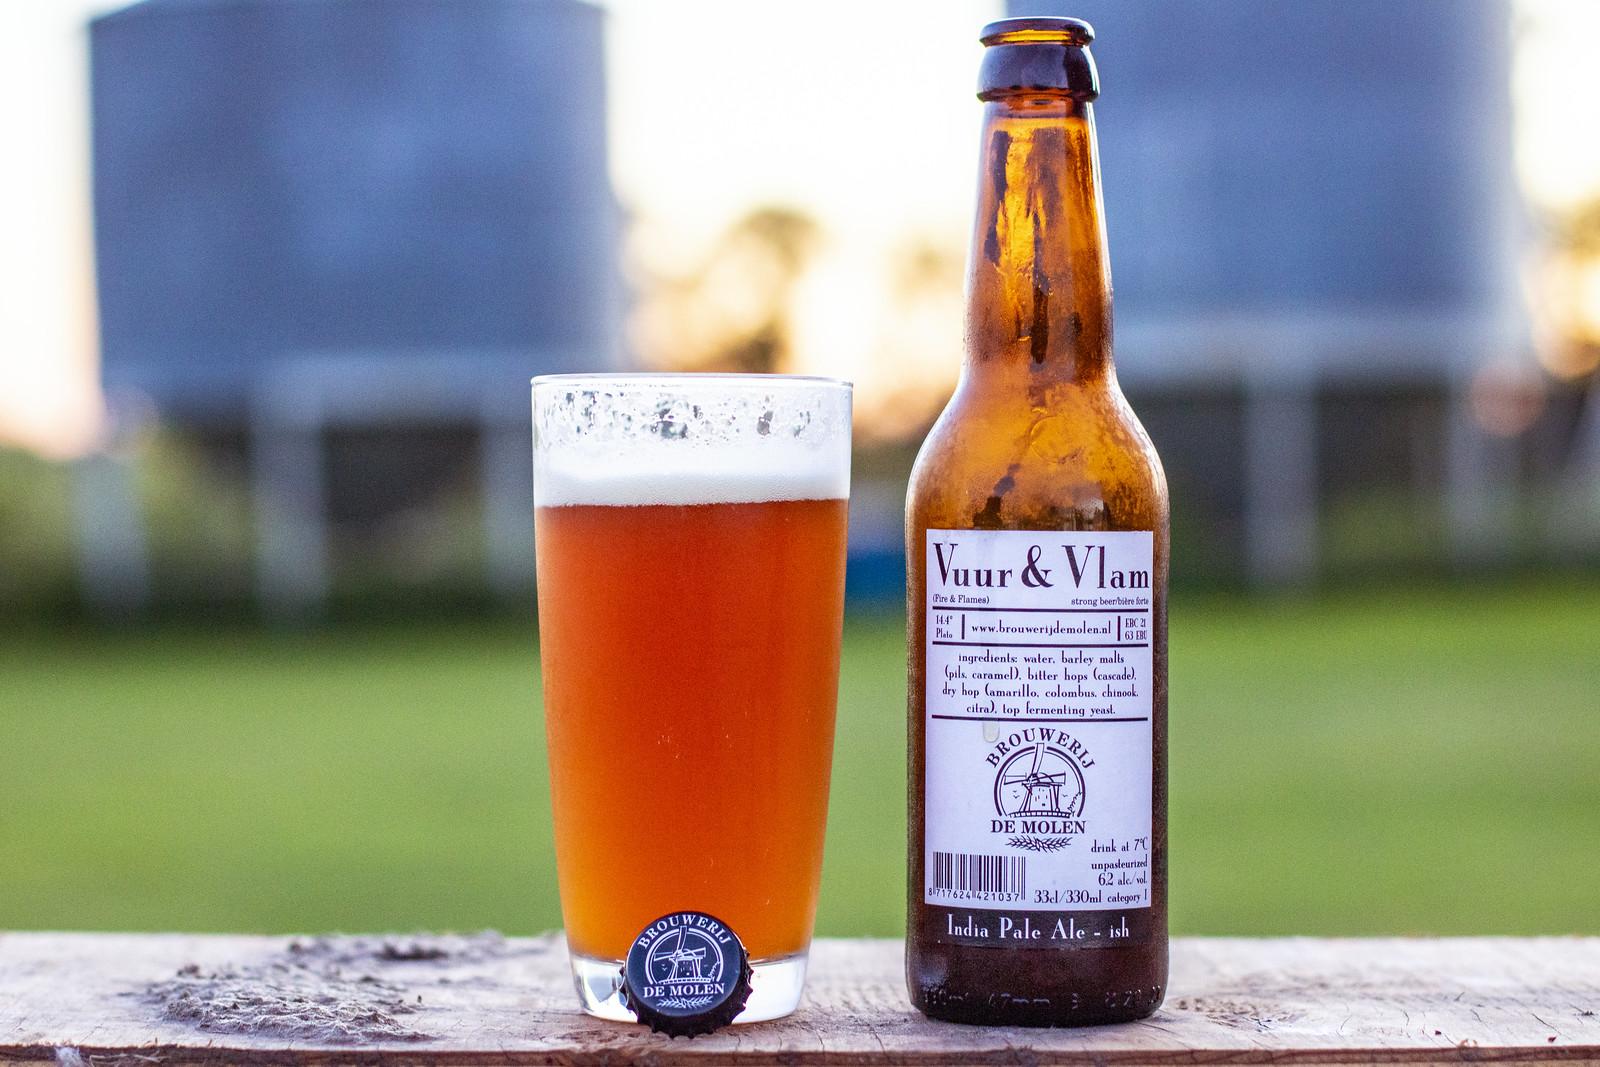 brouwerij de Molen Vurr & Vlam India Pale Ale-ish